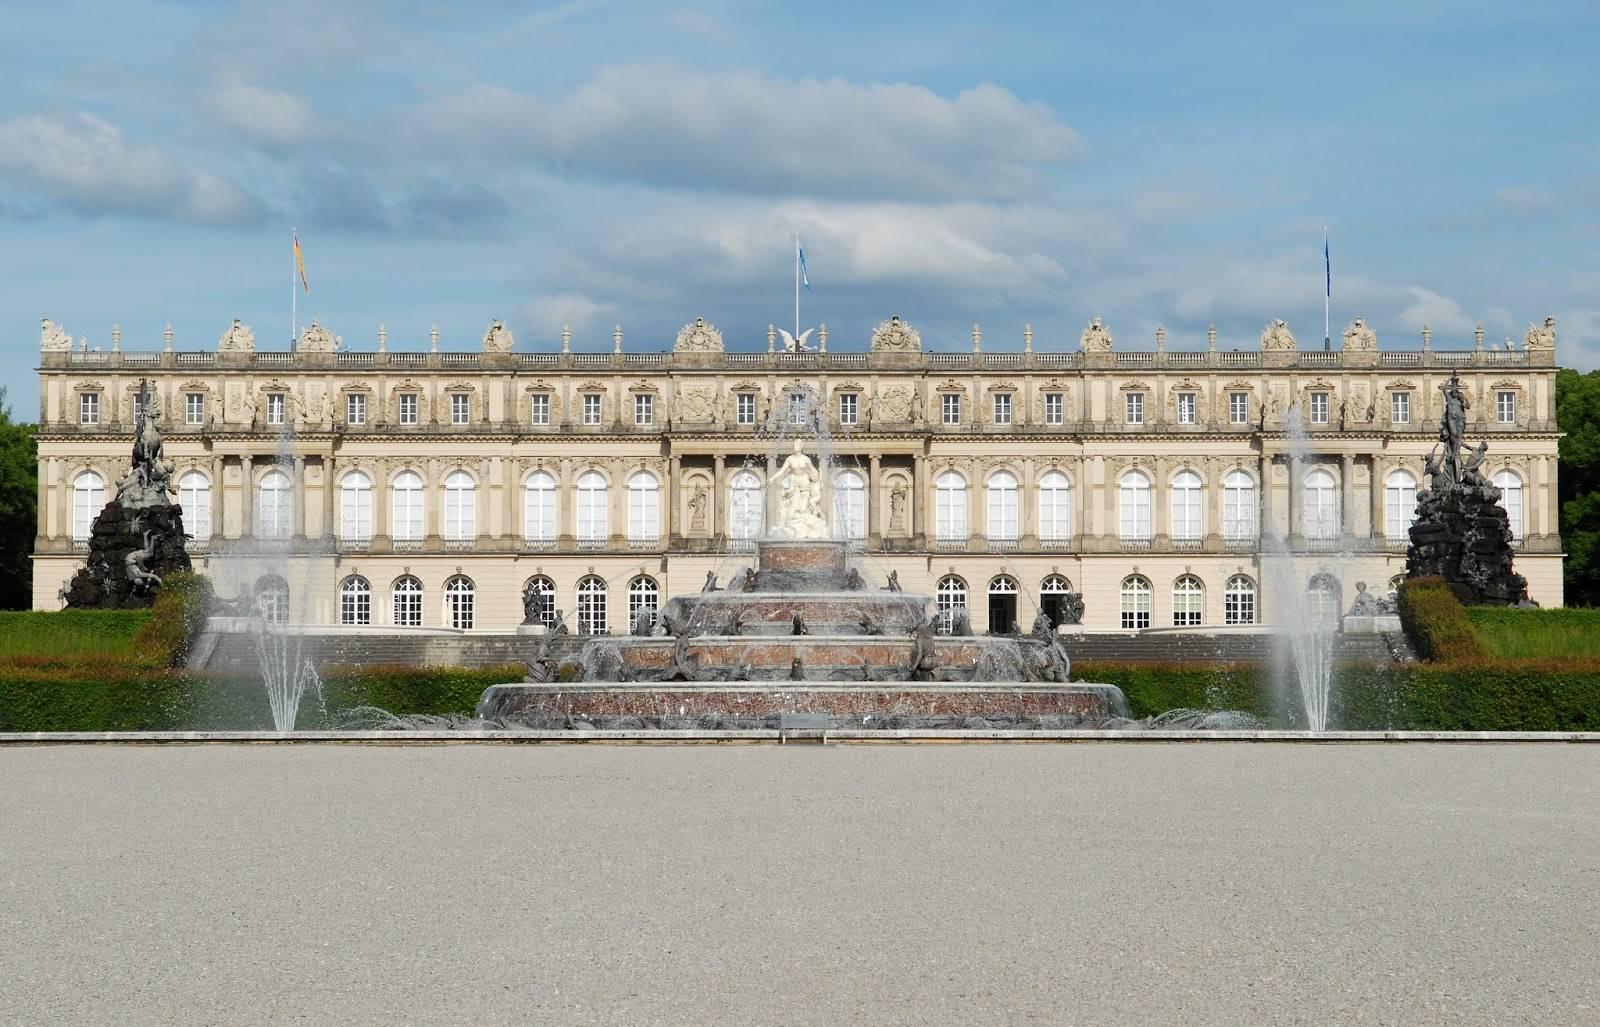 Замки баварии около мюнхена: нойшванштайн, хоэншвангау, линдерхоф, херренкимзее